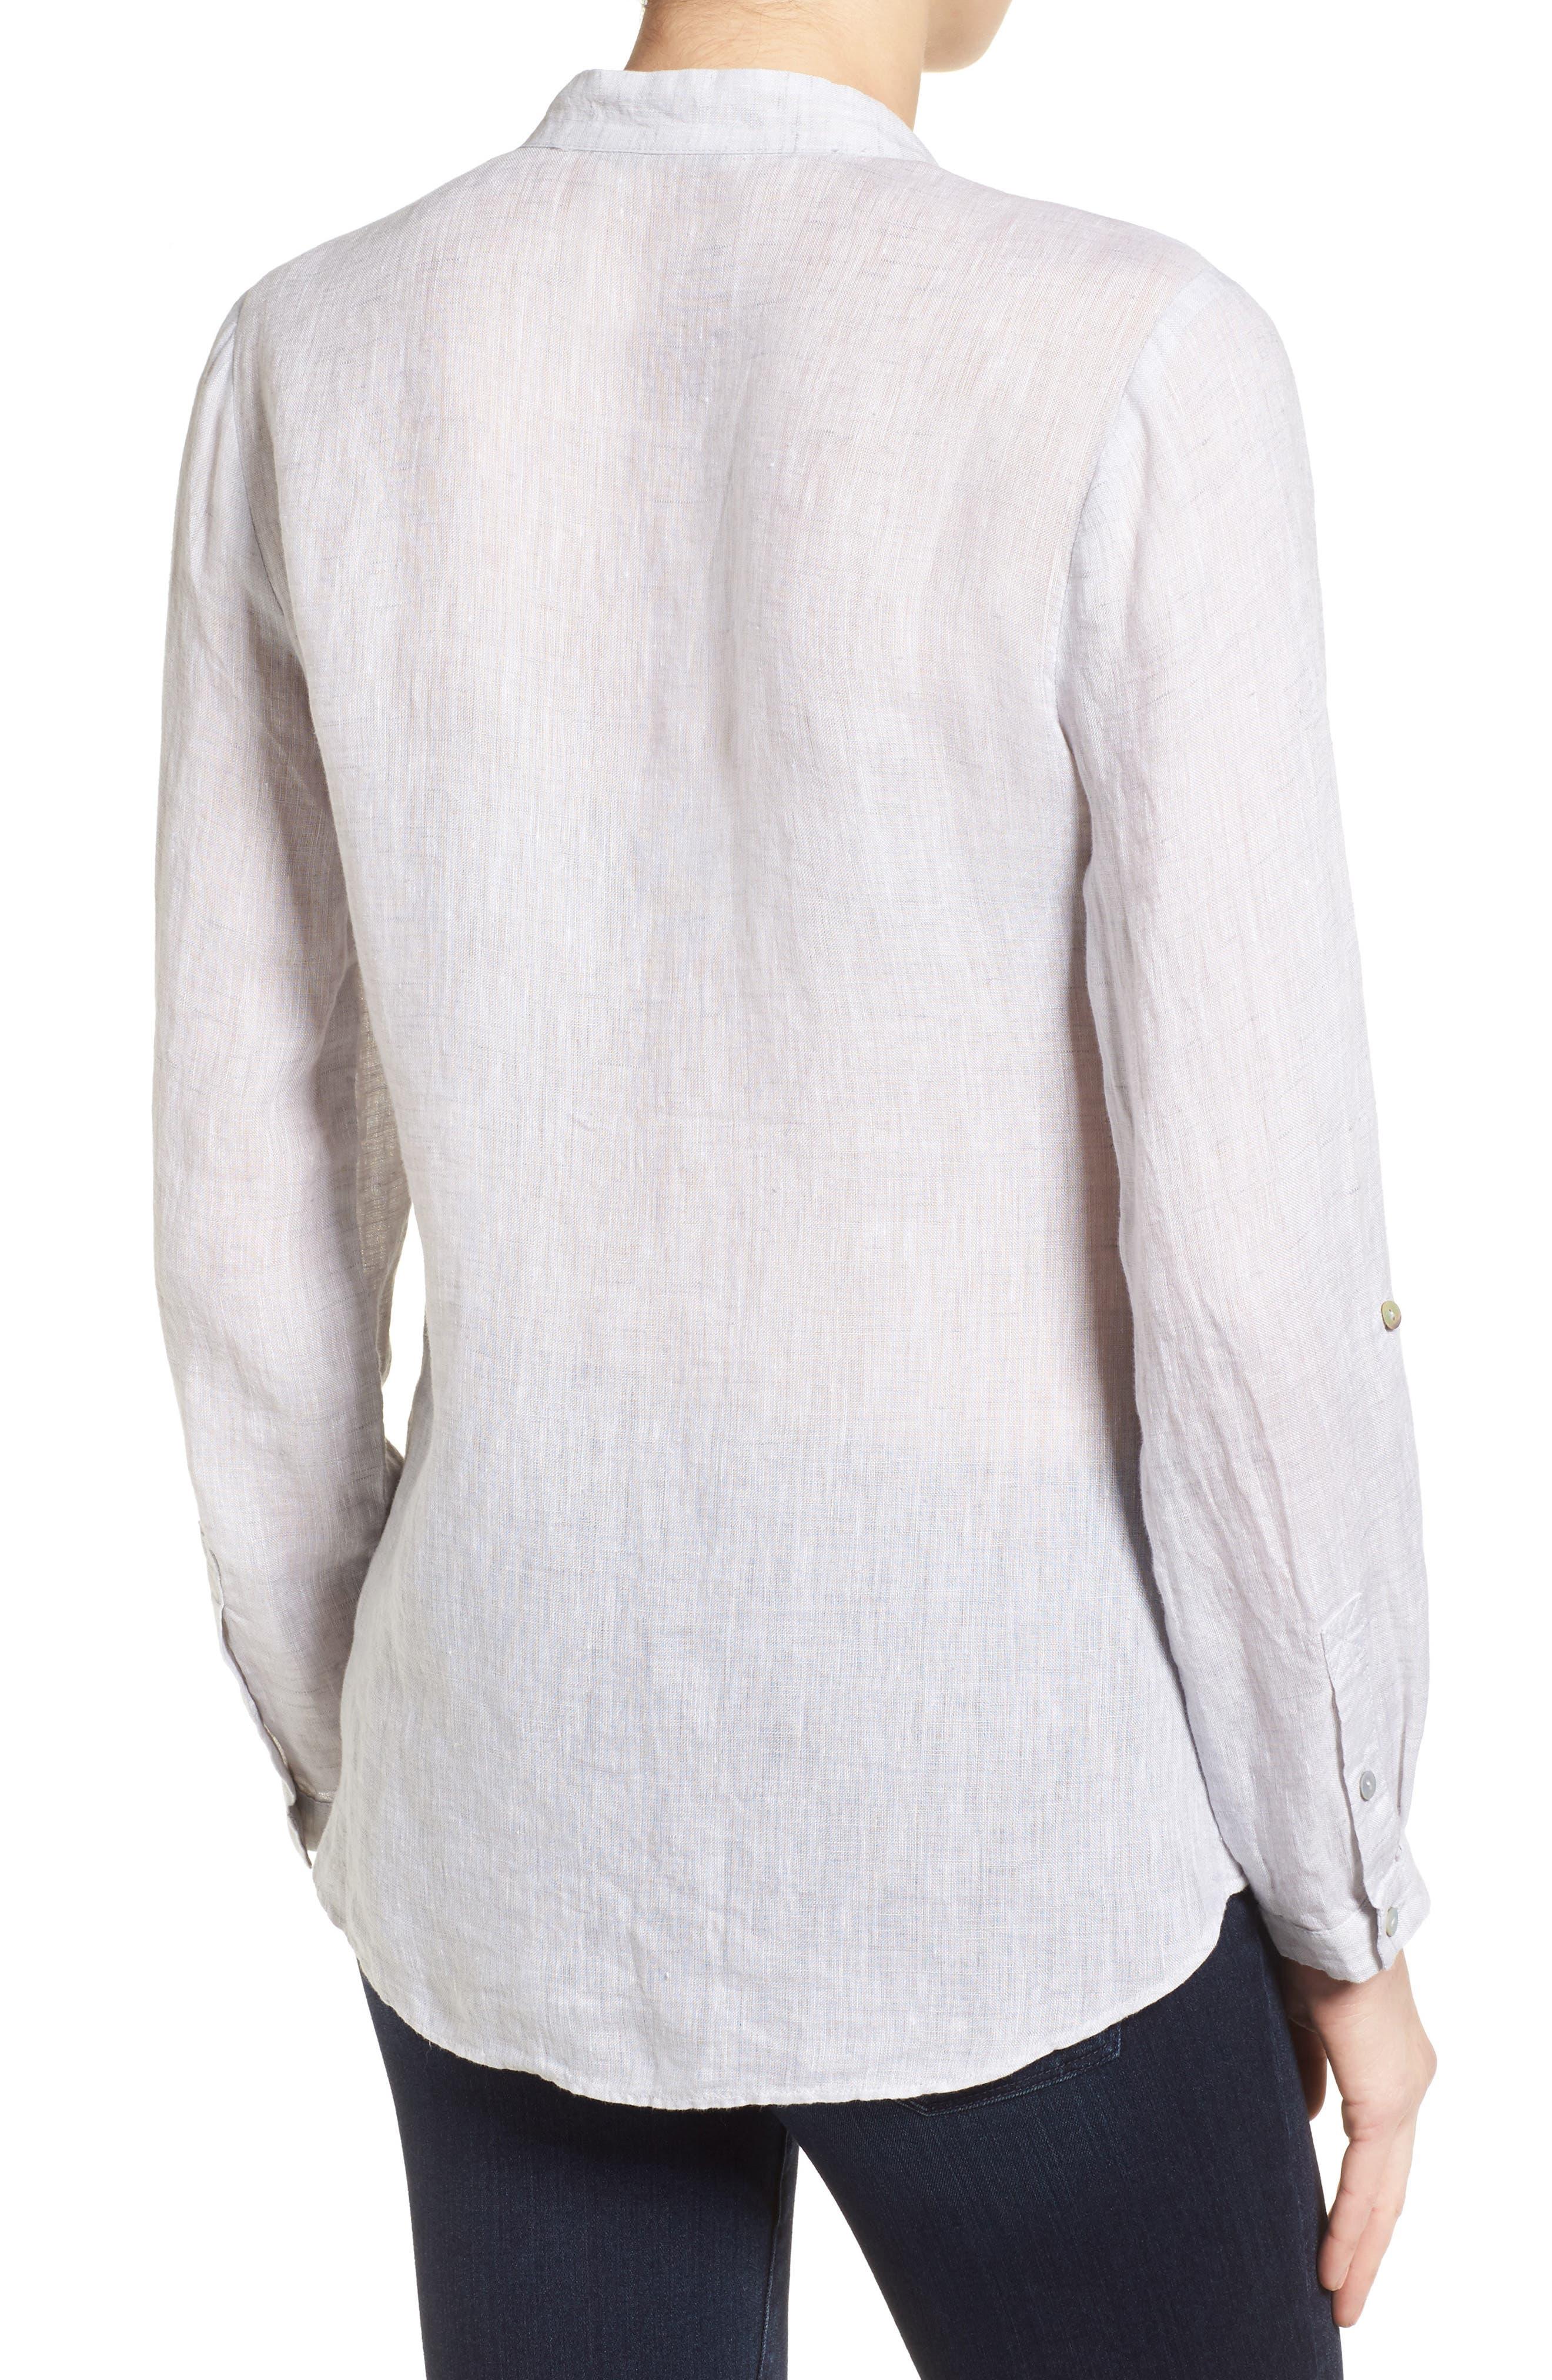 Drifty Linen Shirt,                             Alternate thumbnail 2, color,                             030